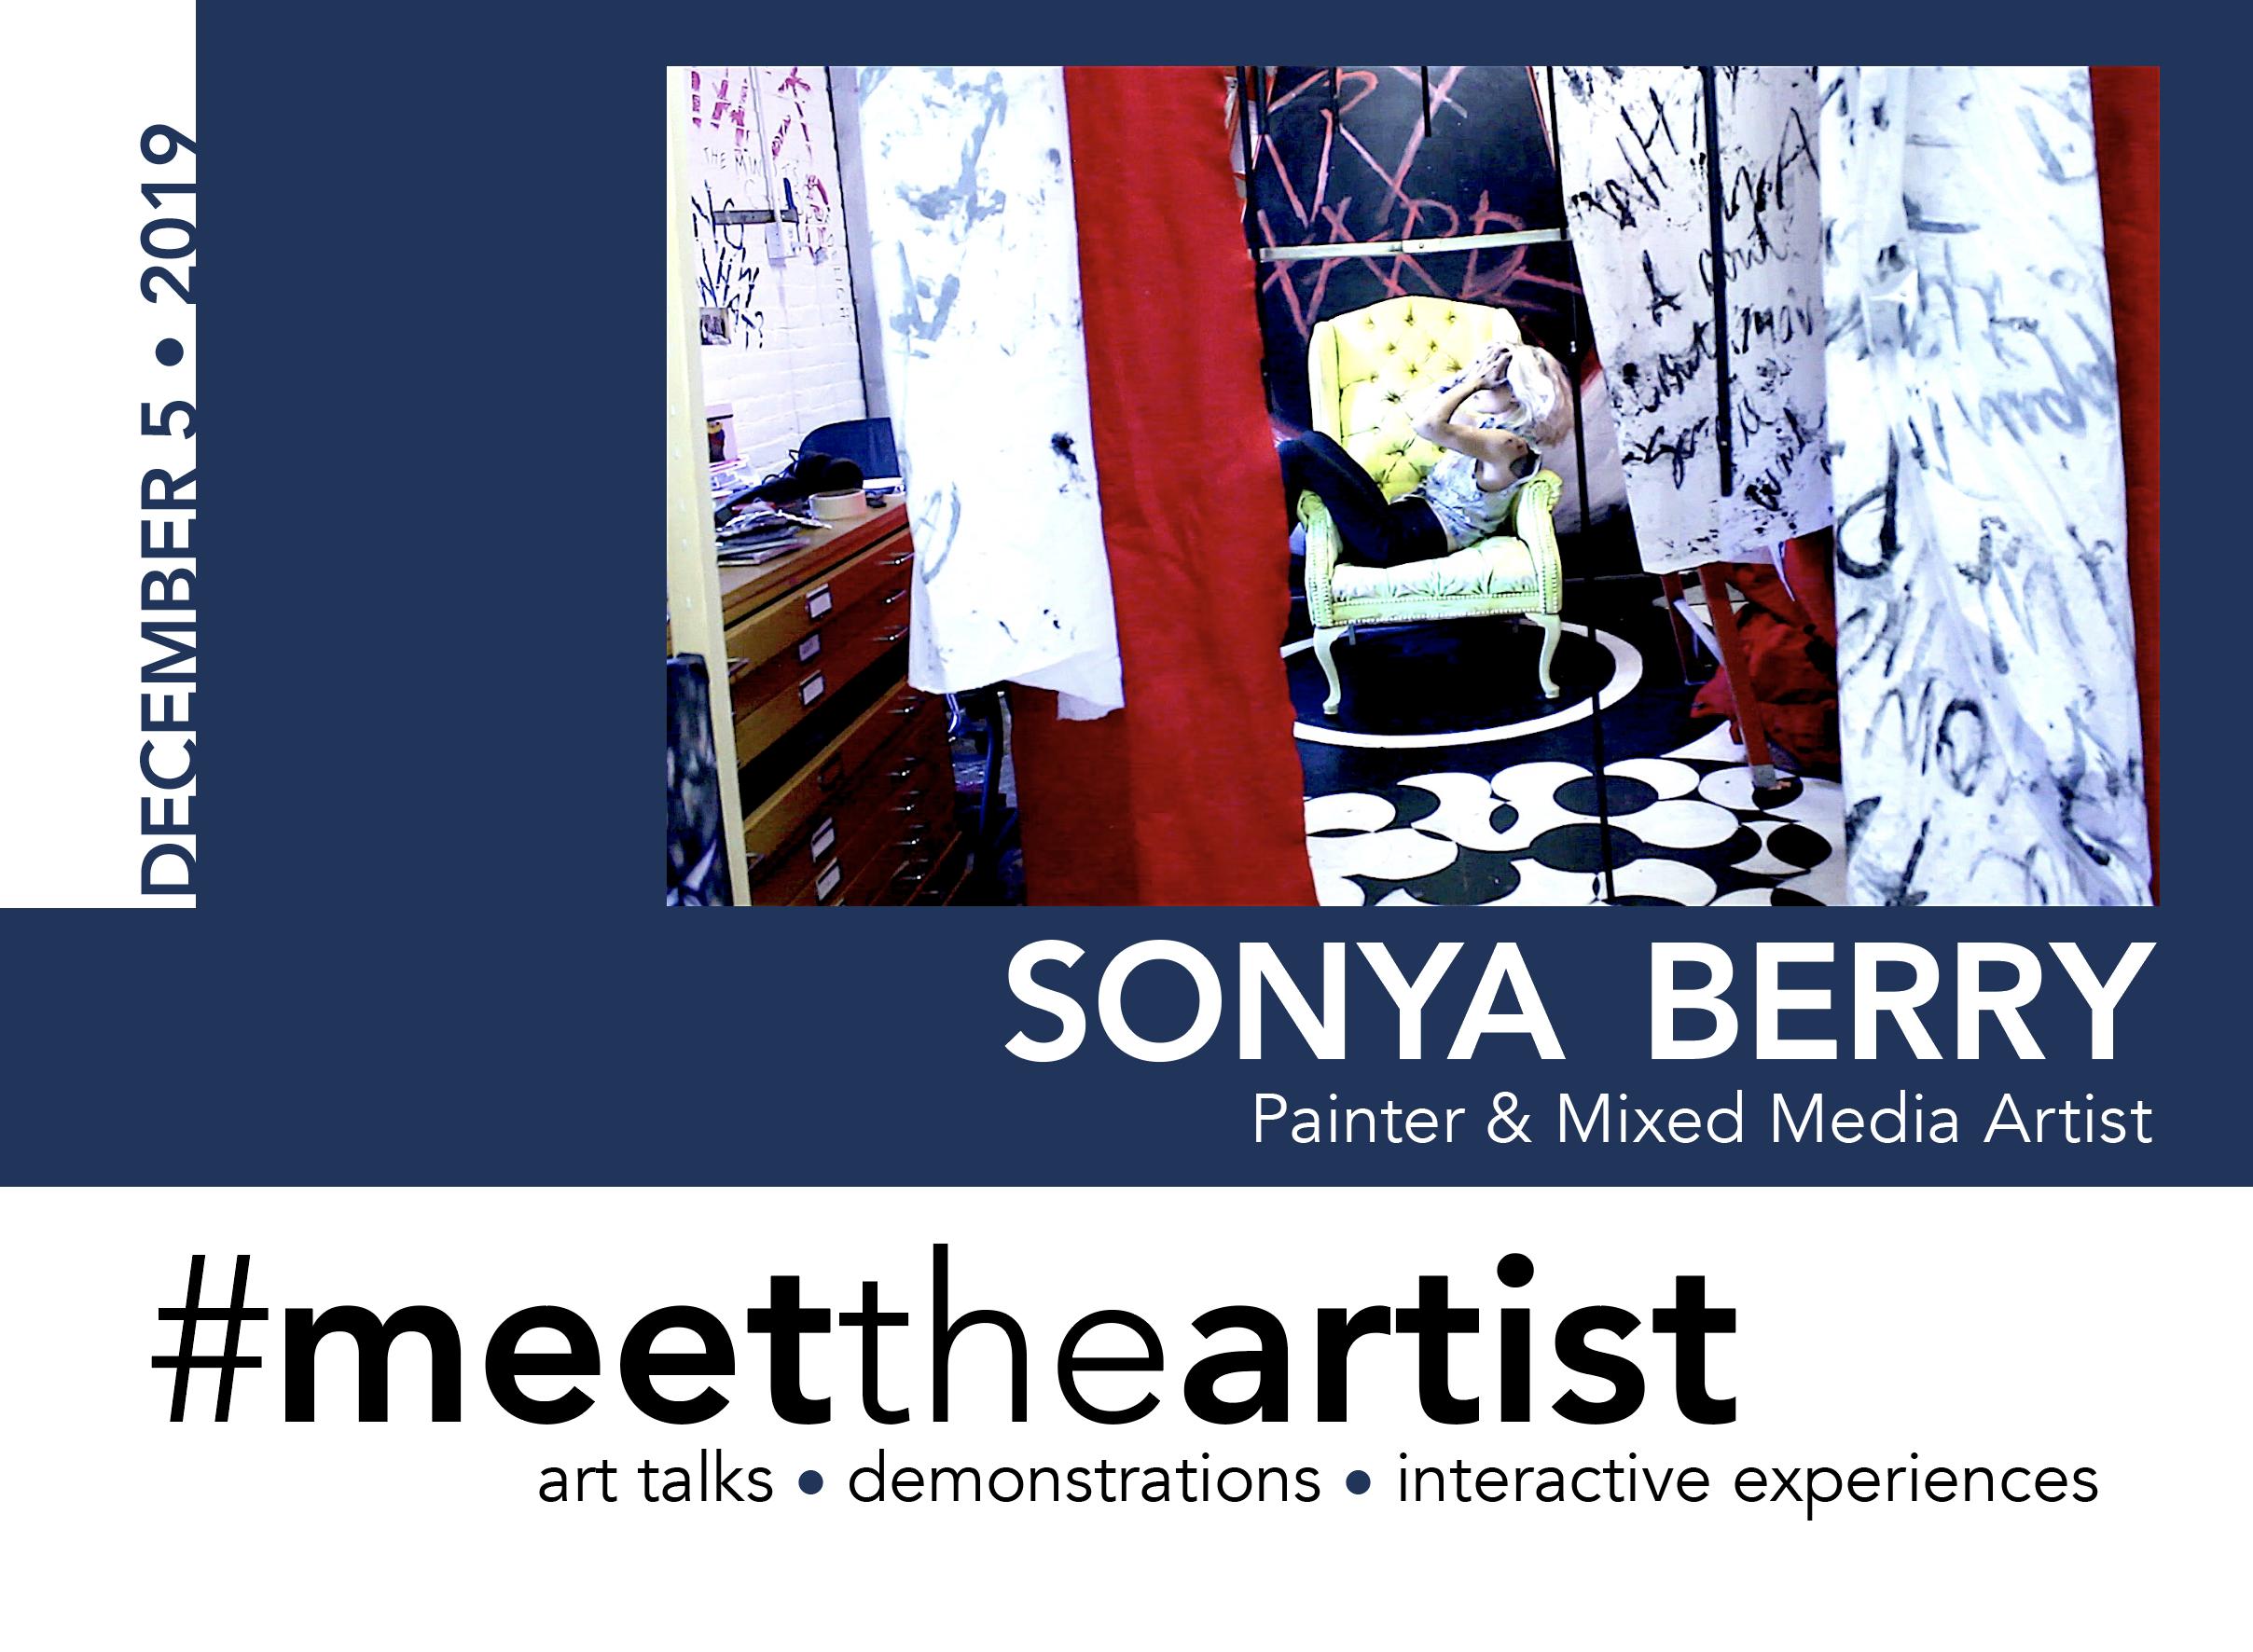 #meettheartist Sonya Berry